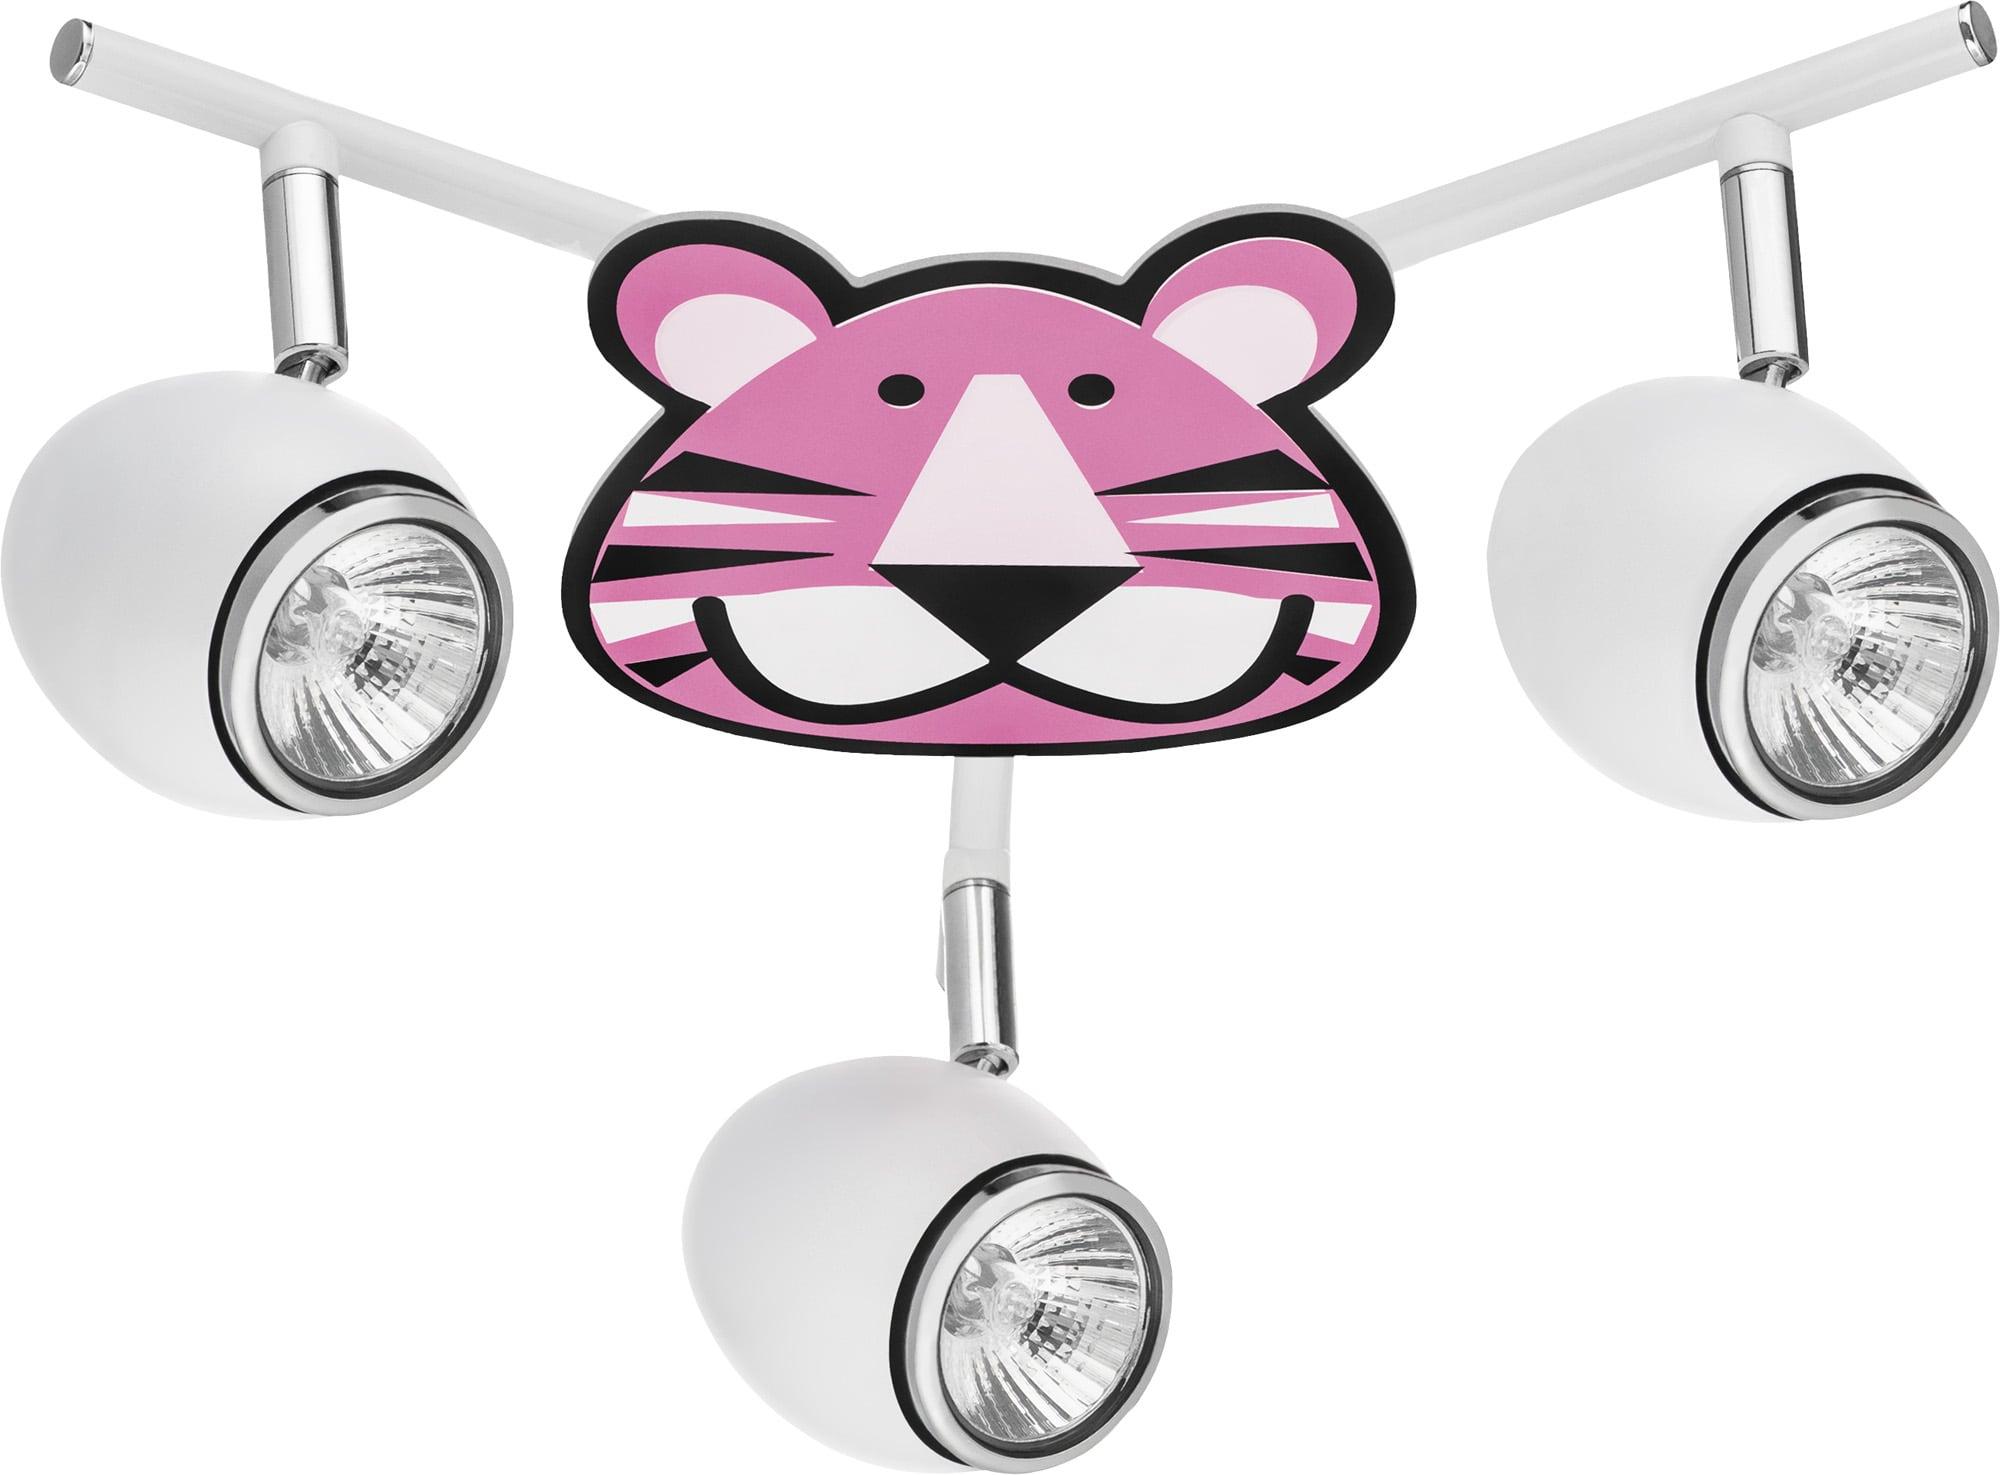 Lamp for child Tygrys - Lenny white / chrome LED 3x4,5W GU10